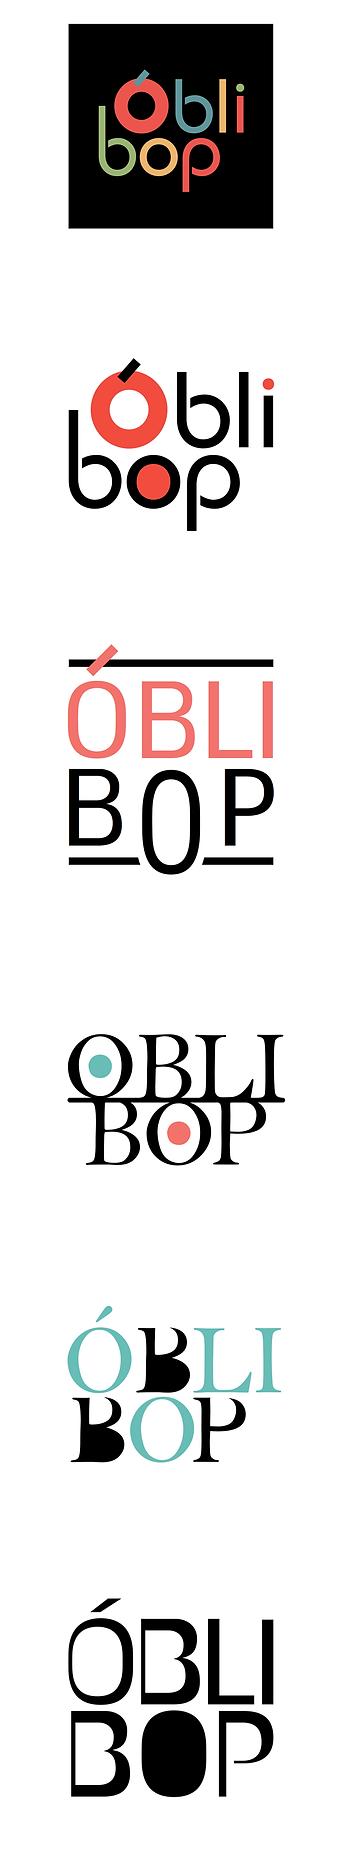 logo_obli_2.png